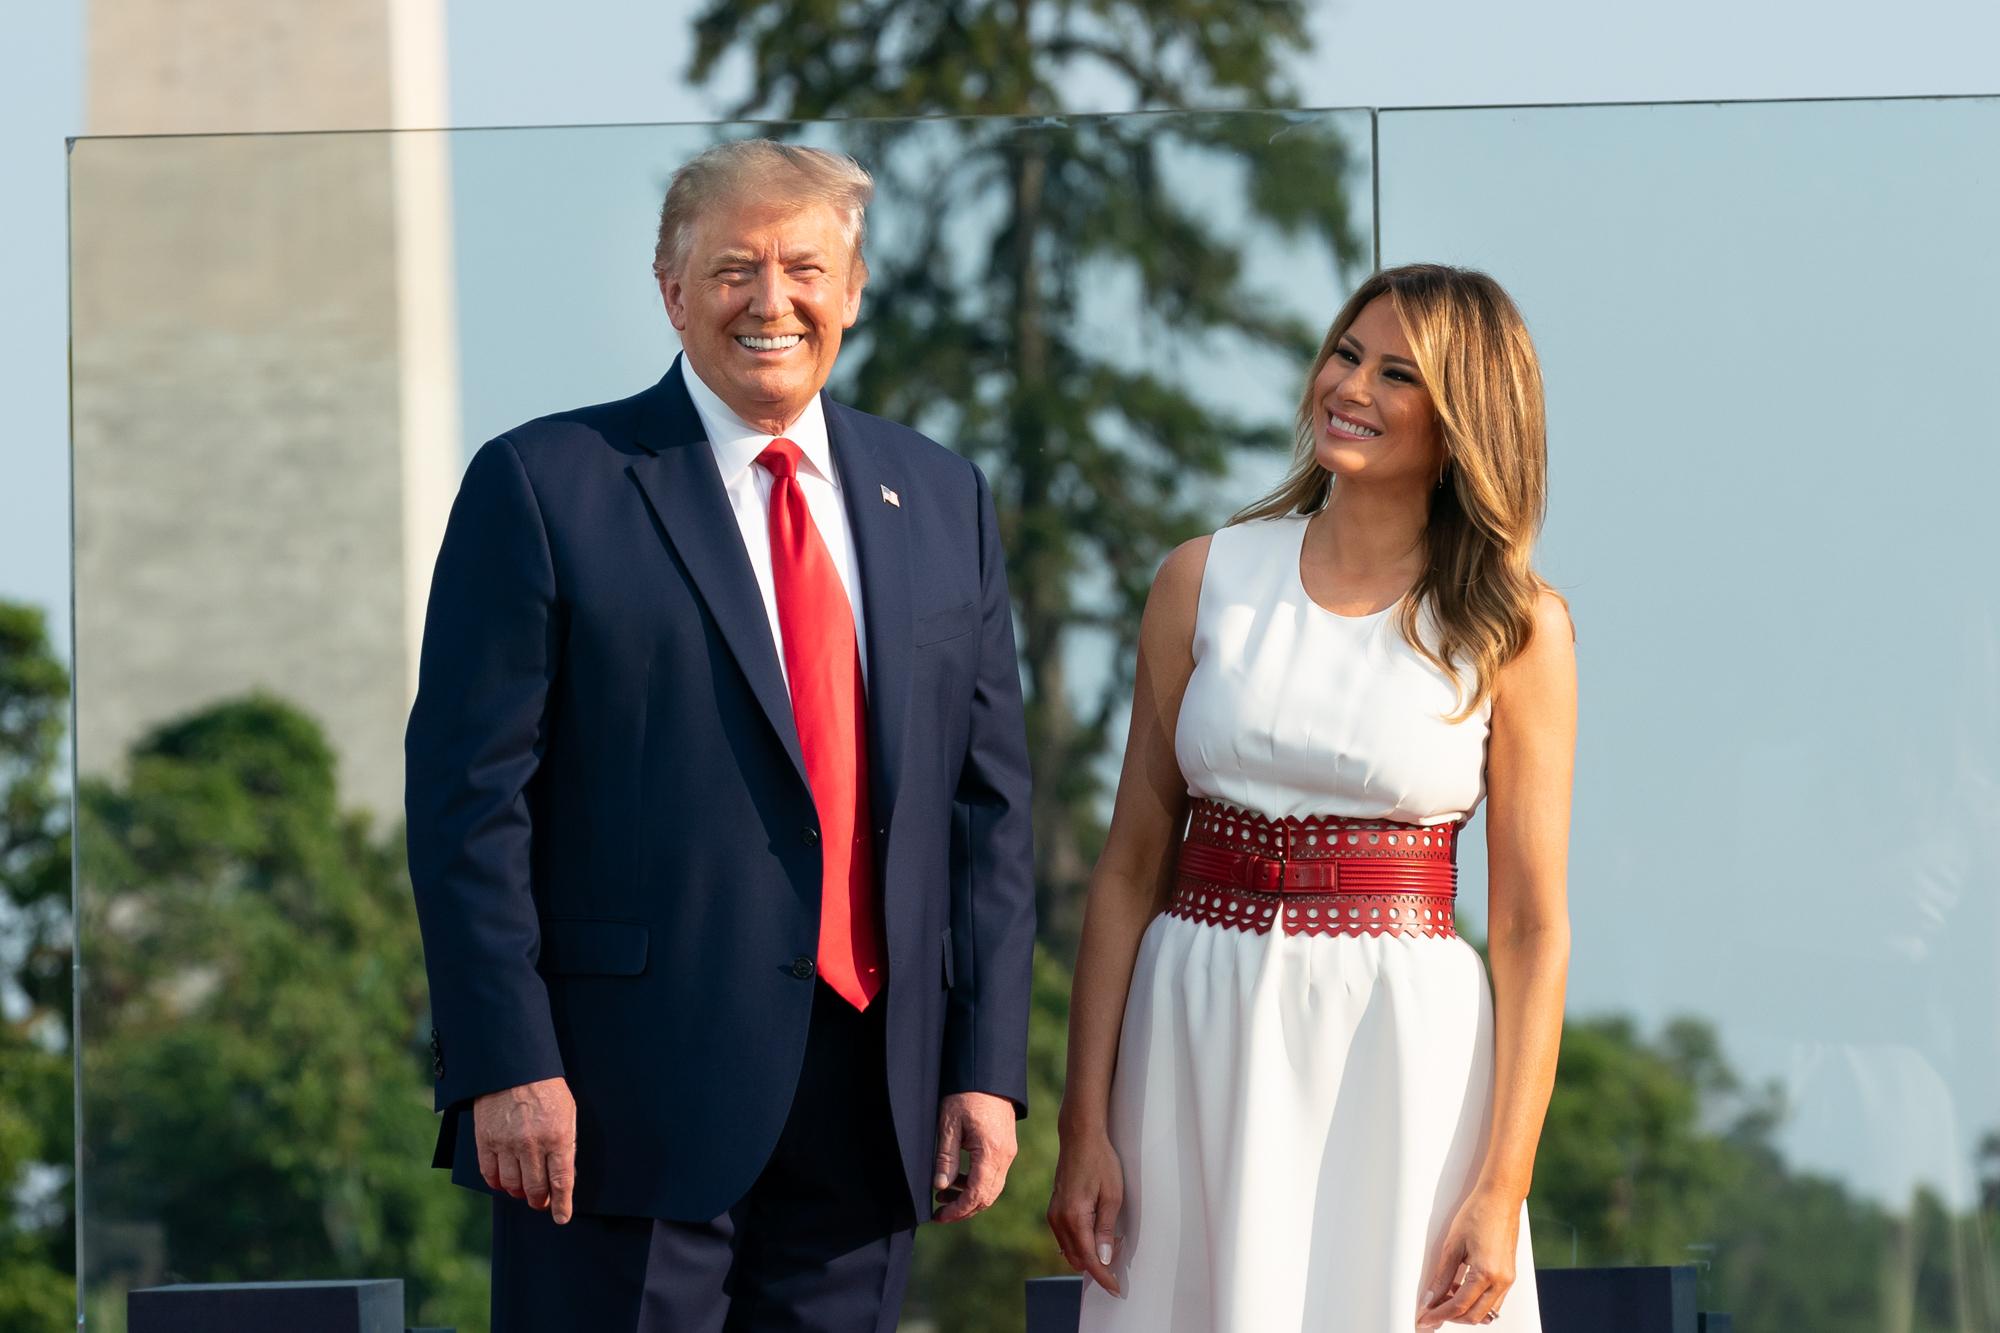 """Trump e la sua escort"", bufera per le parole di Alan Friedman riferite a Melania"